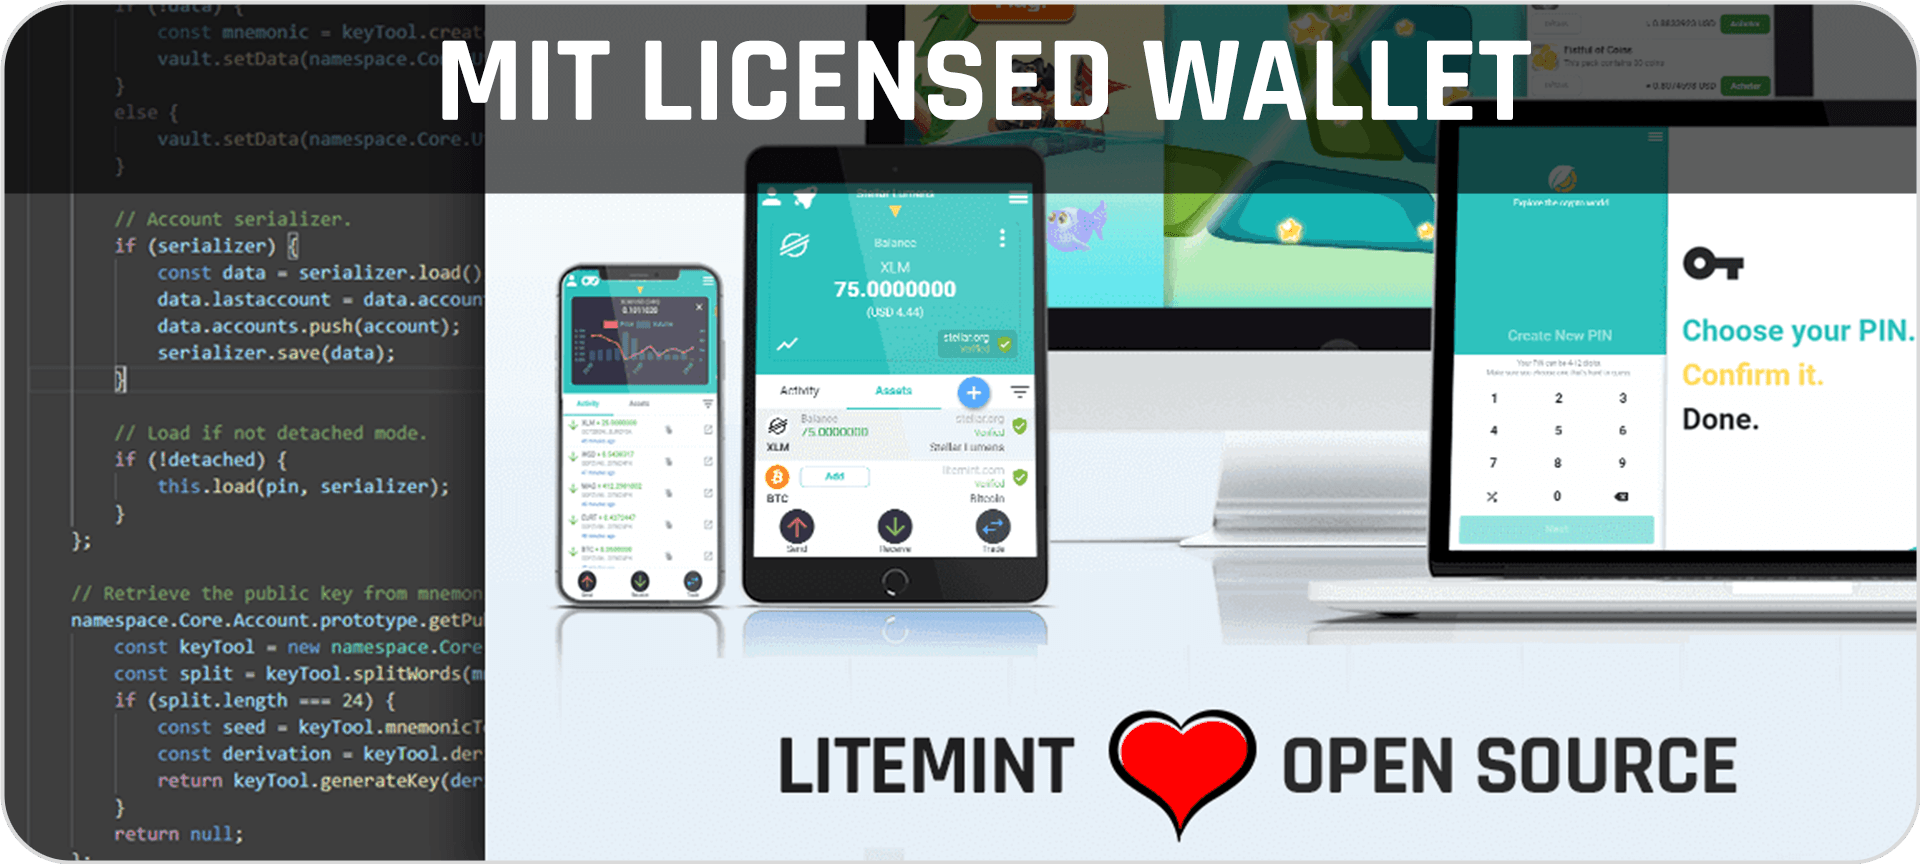 Litemint Open Source